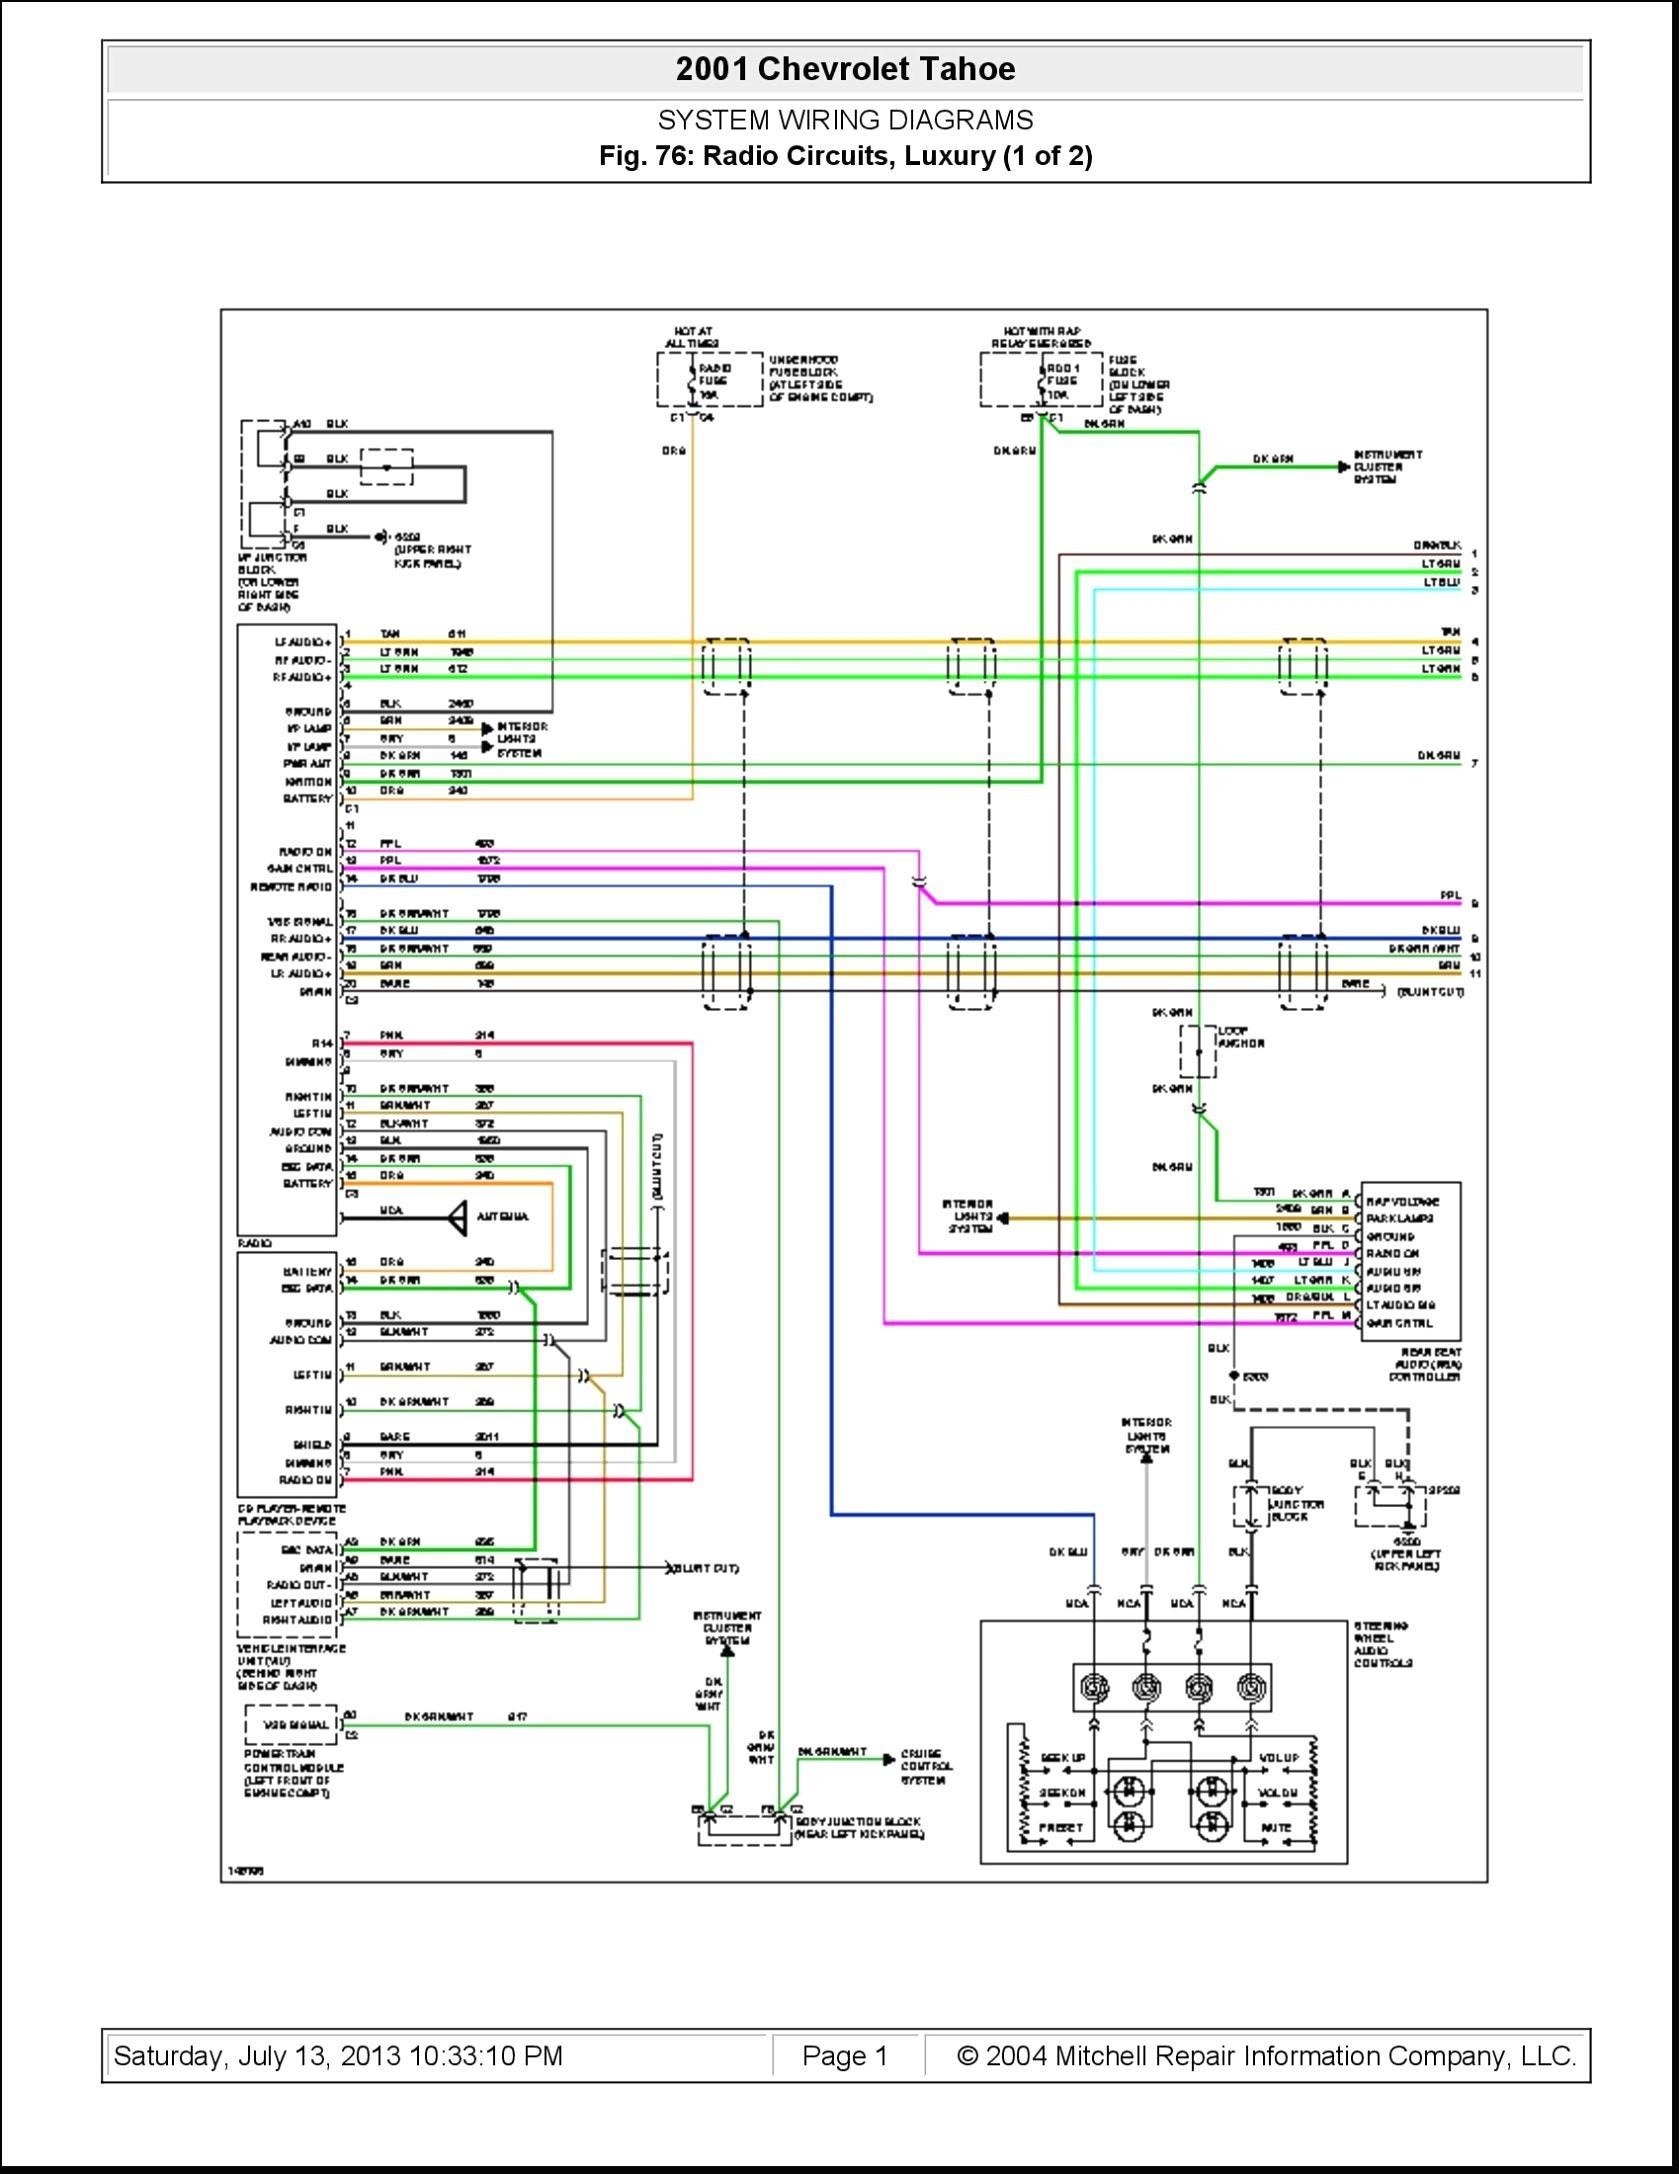 Nd 0651 Wiring Diagram Moreover Toy Lawn Mower Clip Art On Ssr 125cc Pit Bike Wiring Diagram